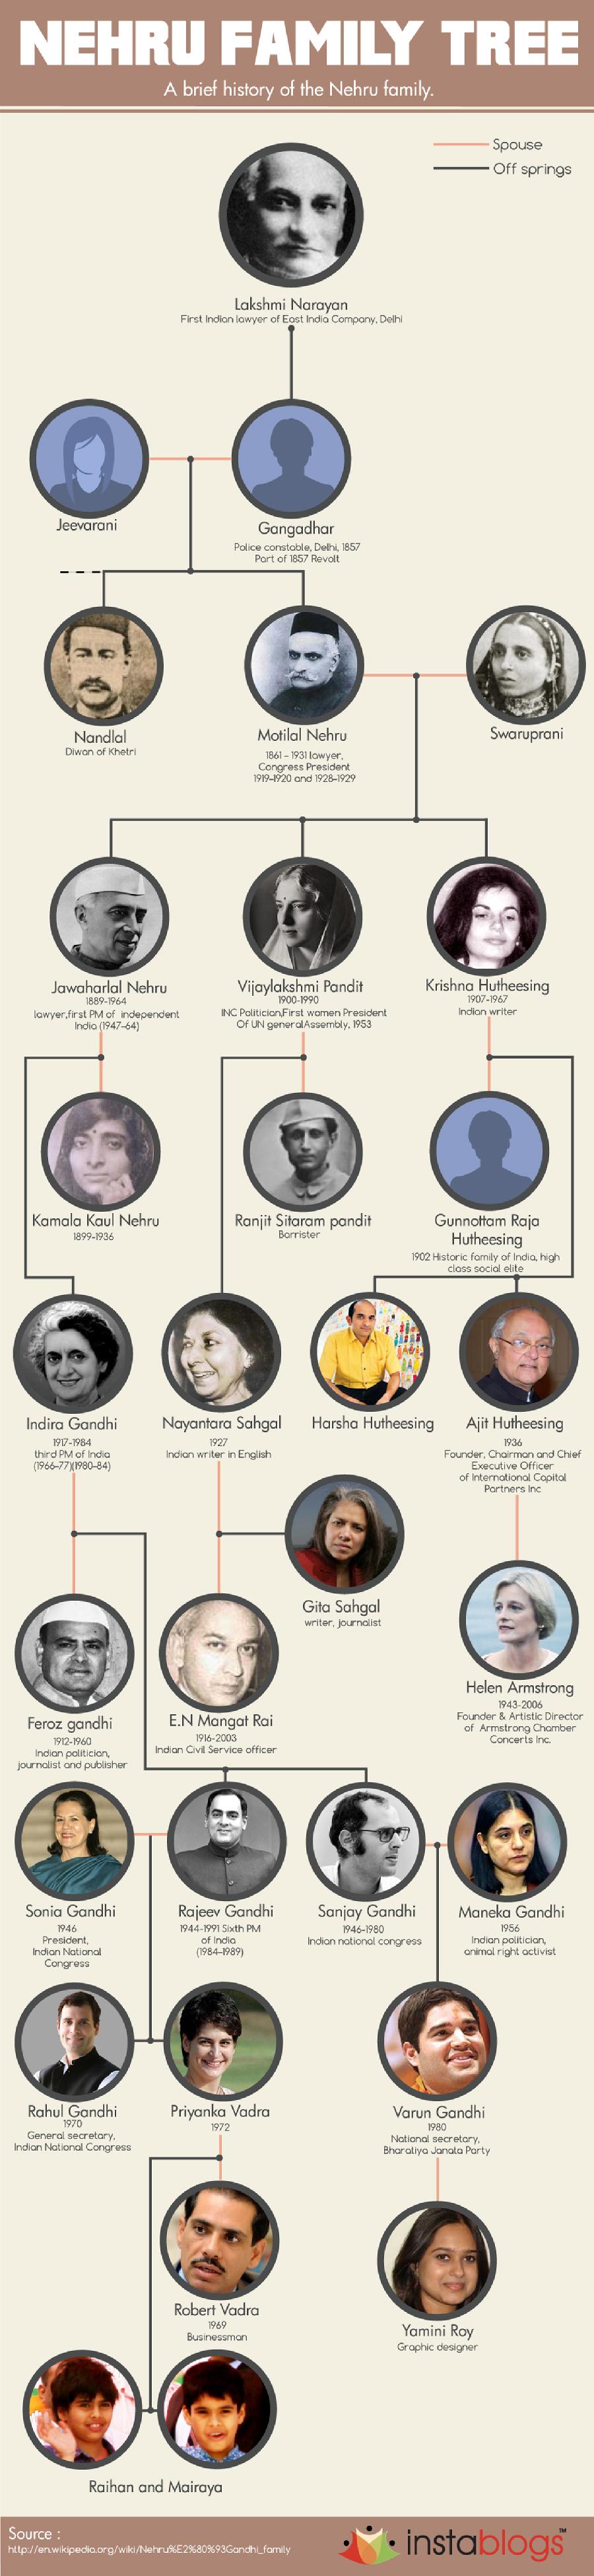 Nehru family tree